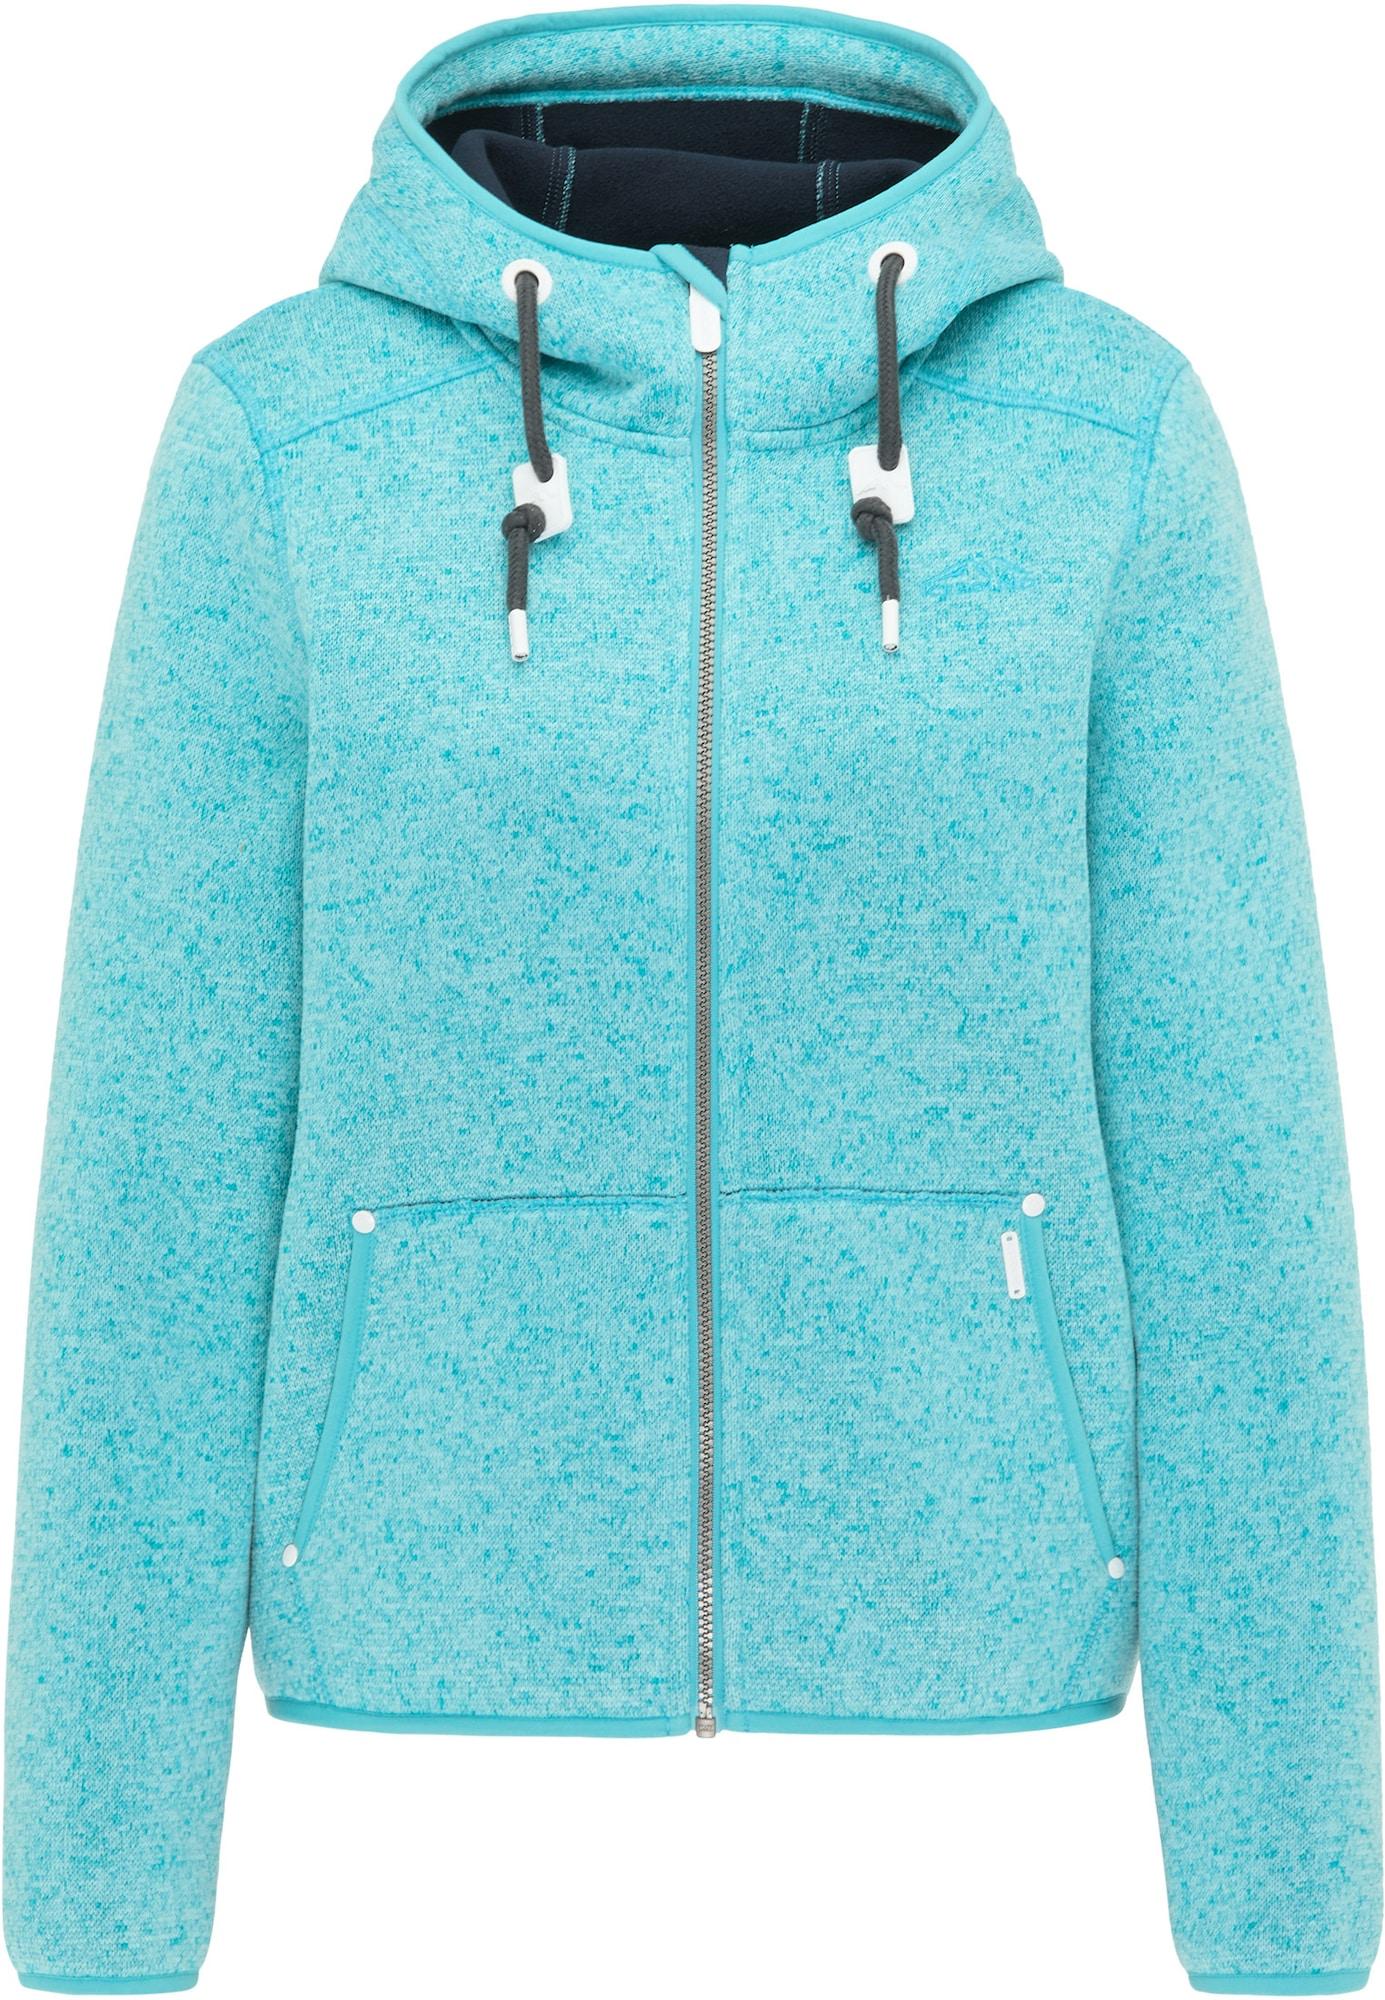 ICEBOUND Flisinis džemperis turkio spalva